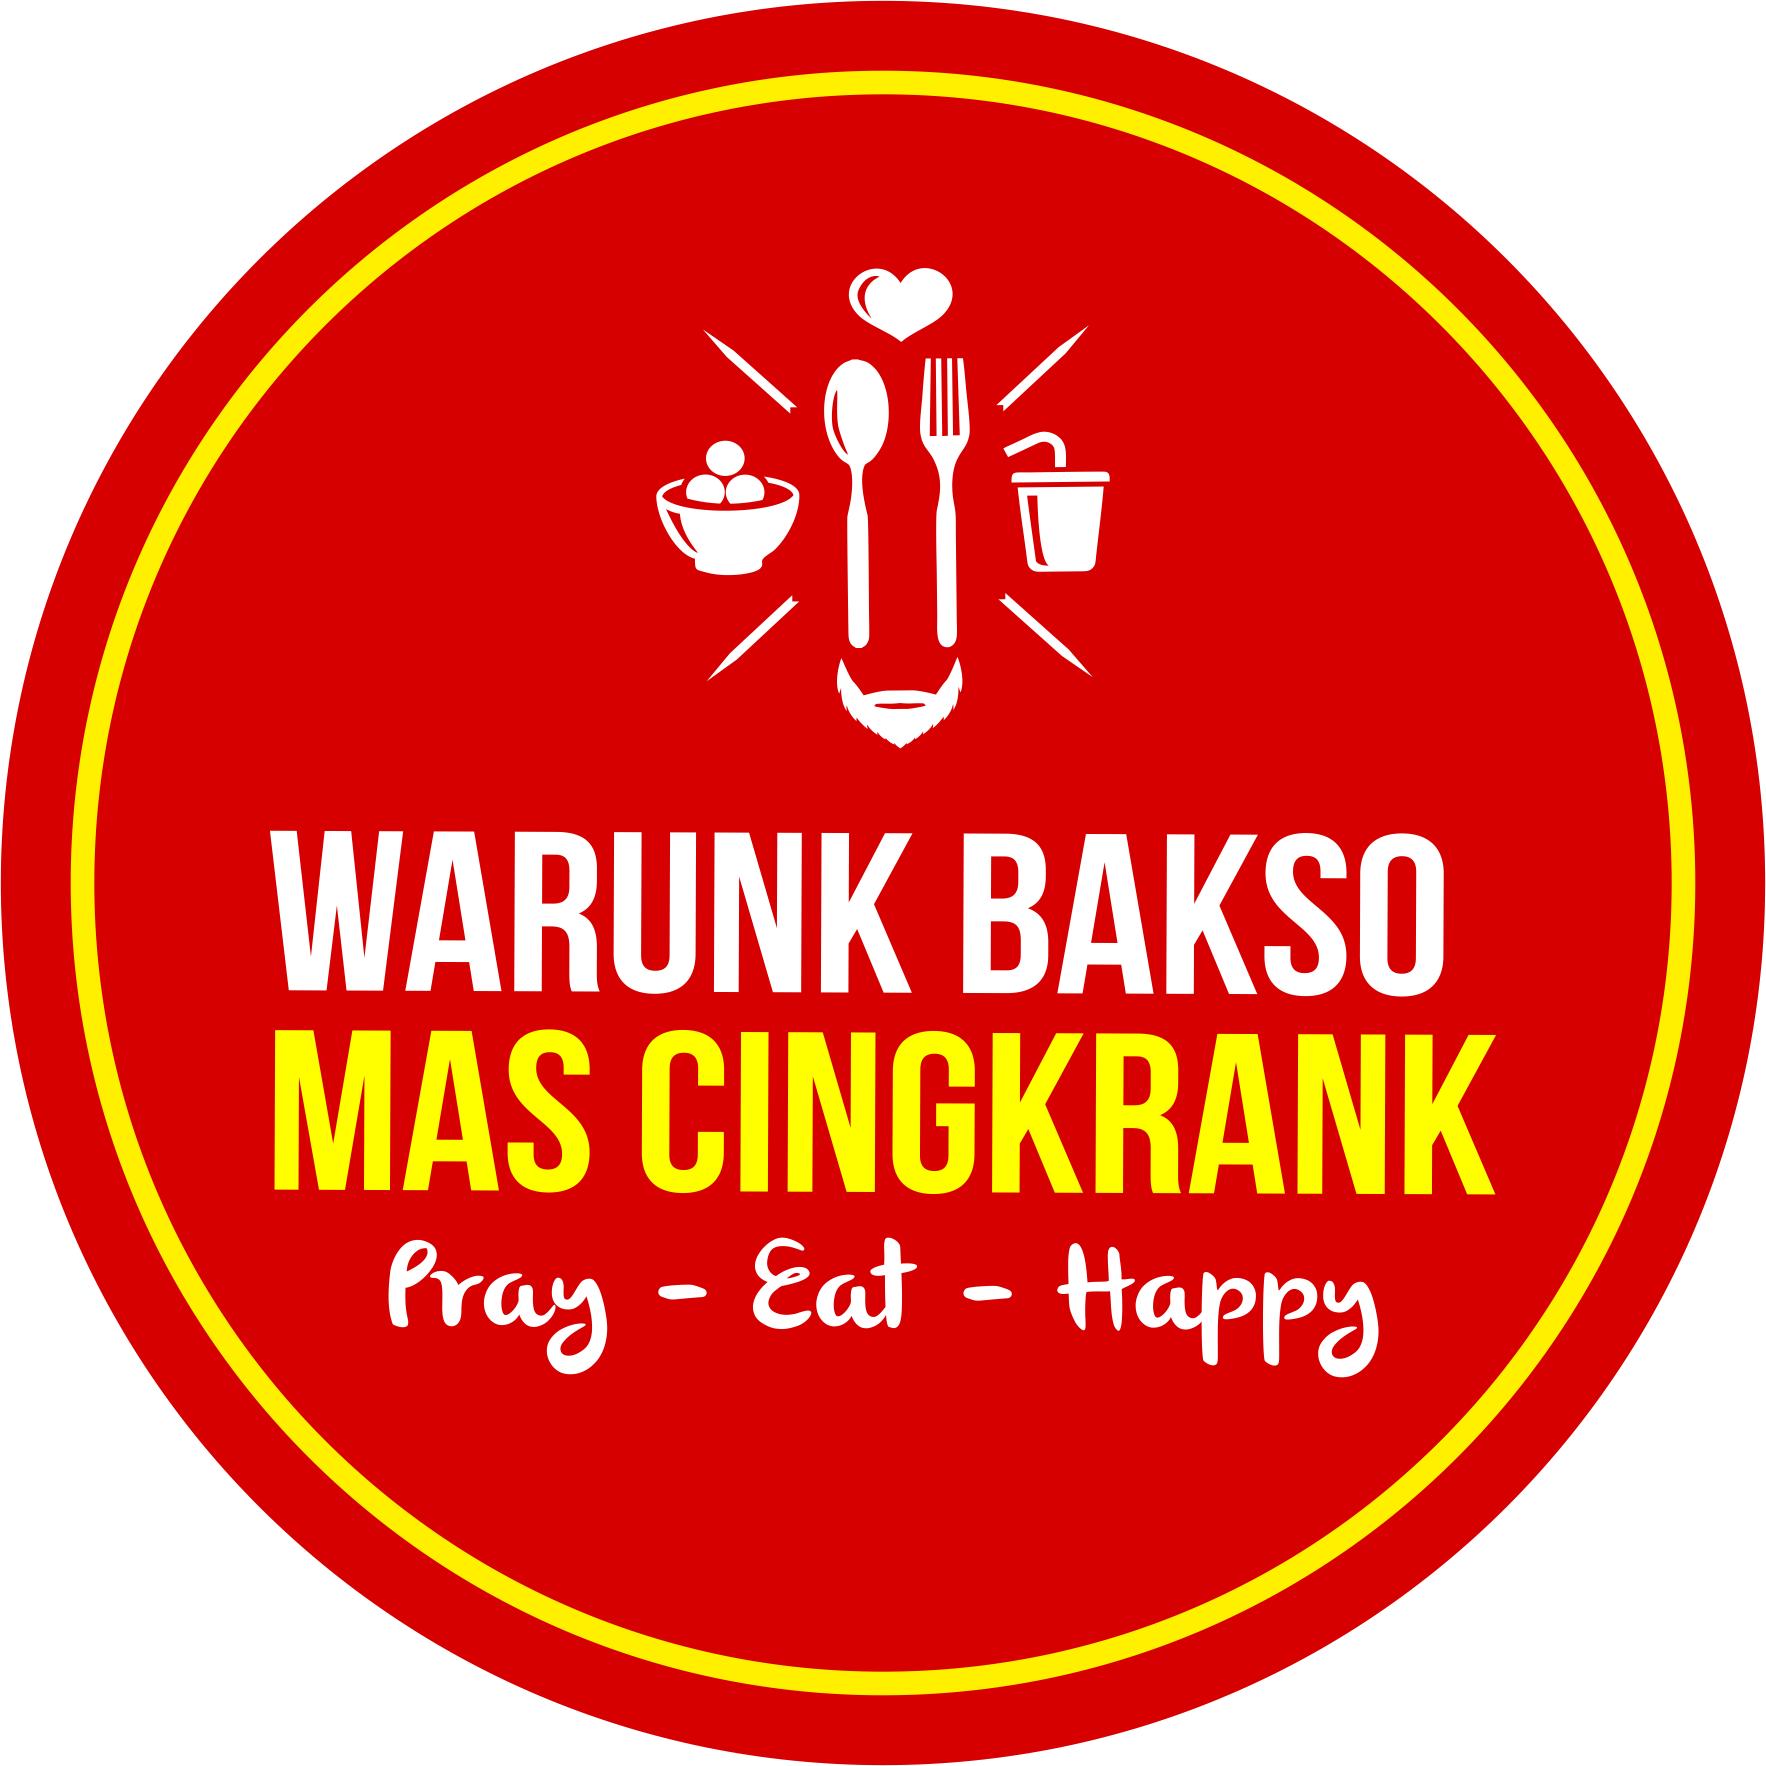 The logo of the Warung Baksi Mas Cingkrank business